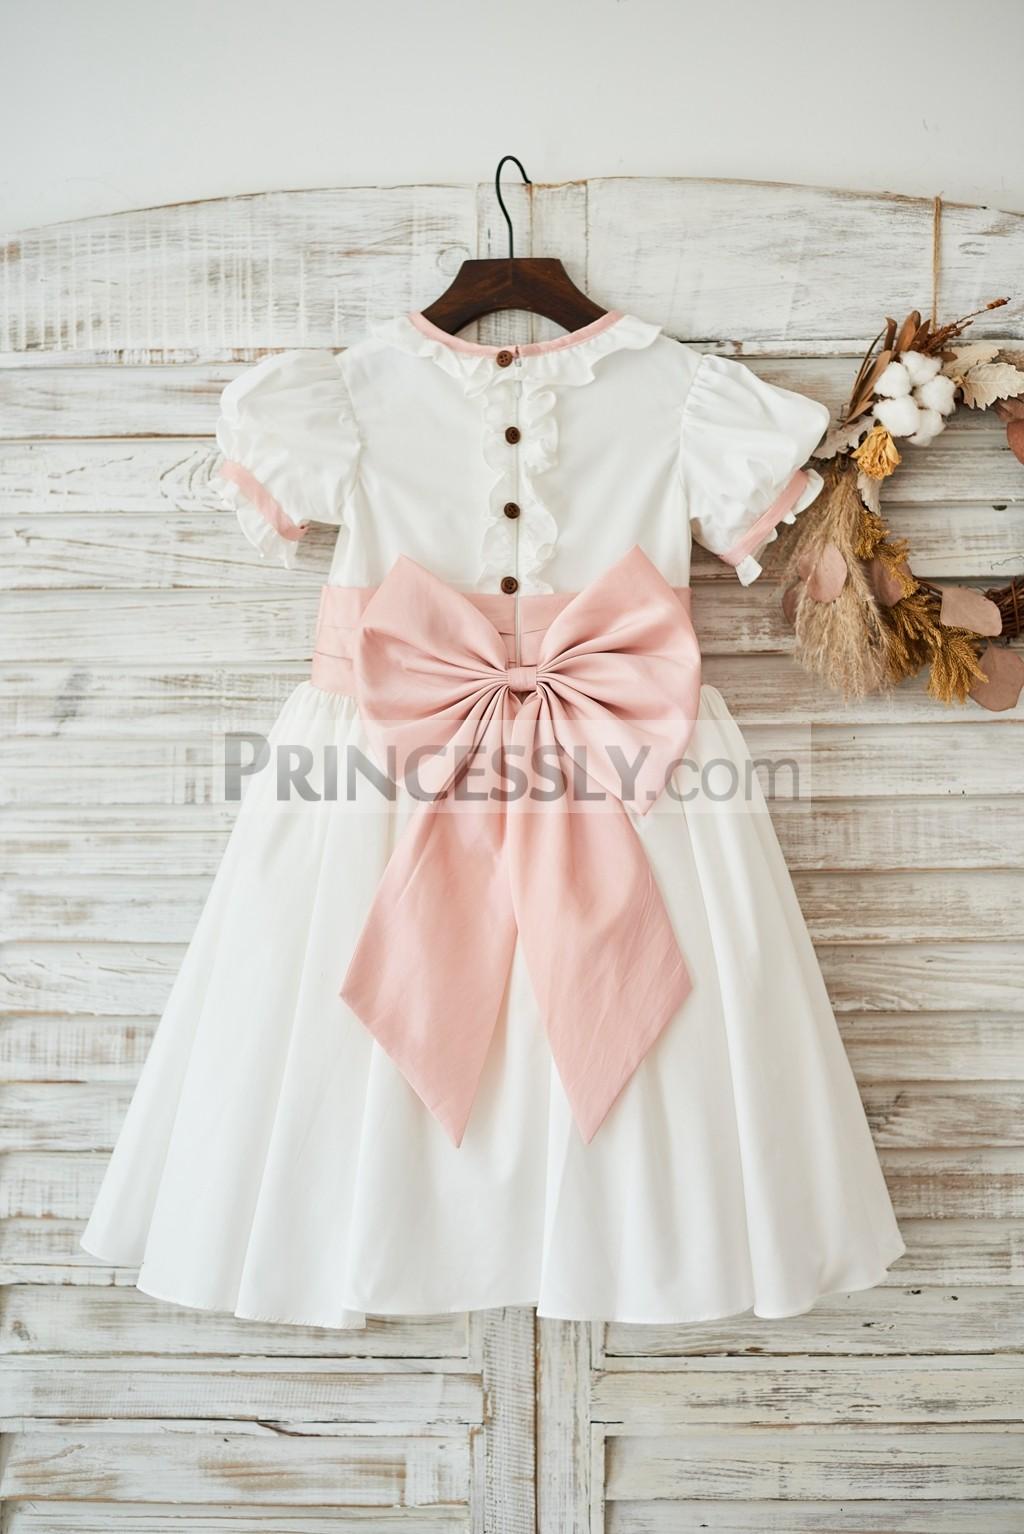 Cotton Vintage Wedding Little Girl Dress